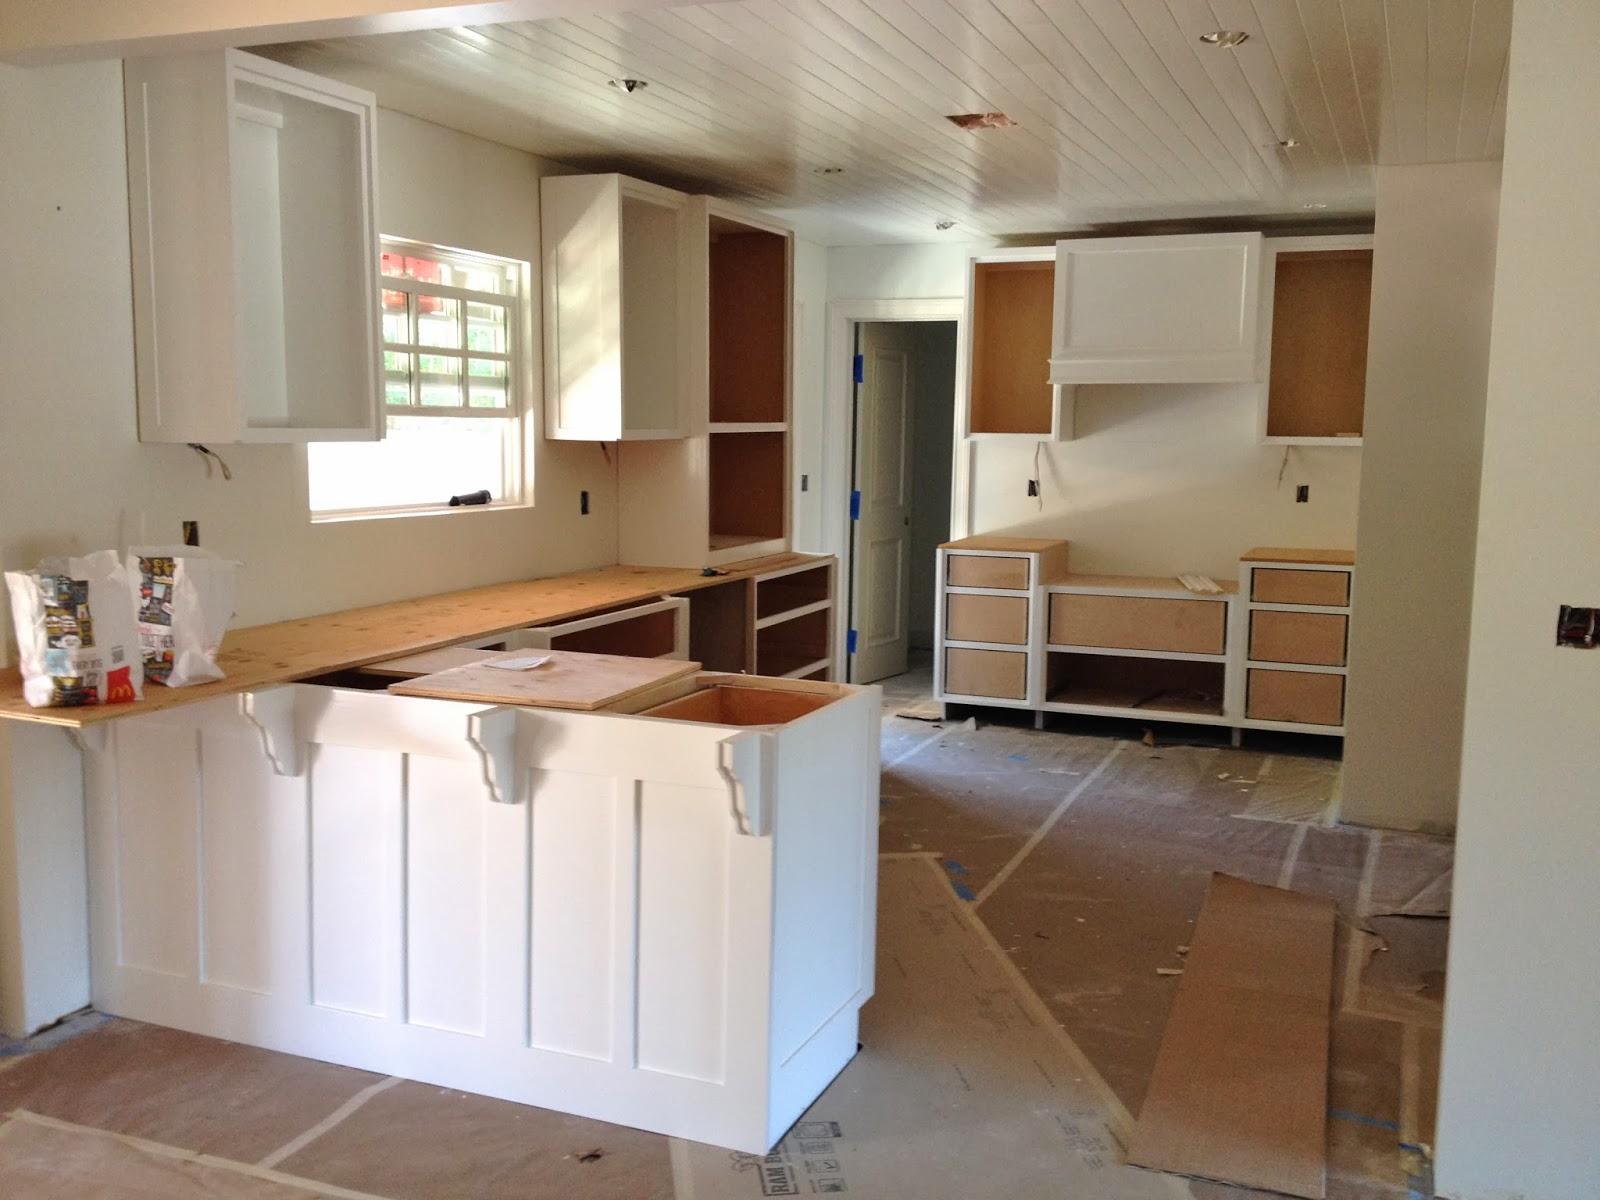 Cape Cod Kitchen Design Hood Renovation Ideas Perfect Full Size Of